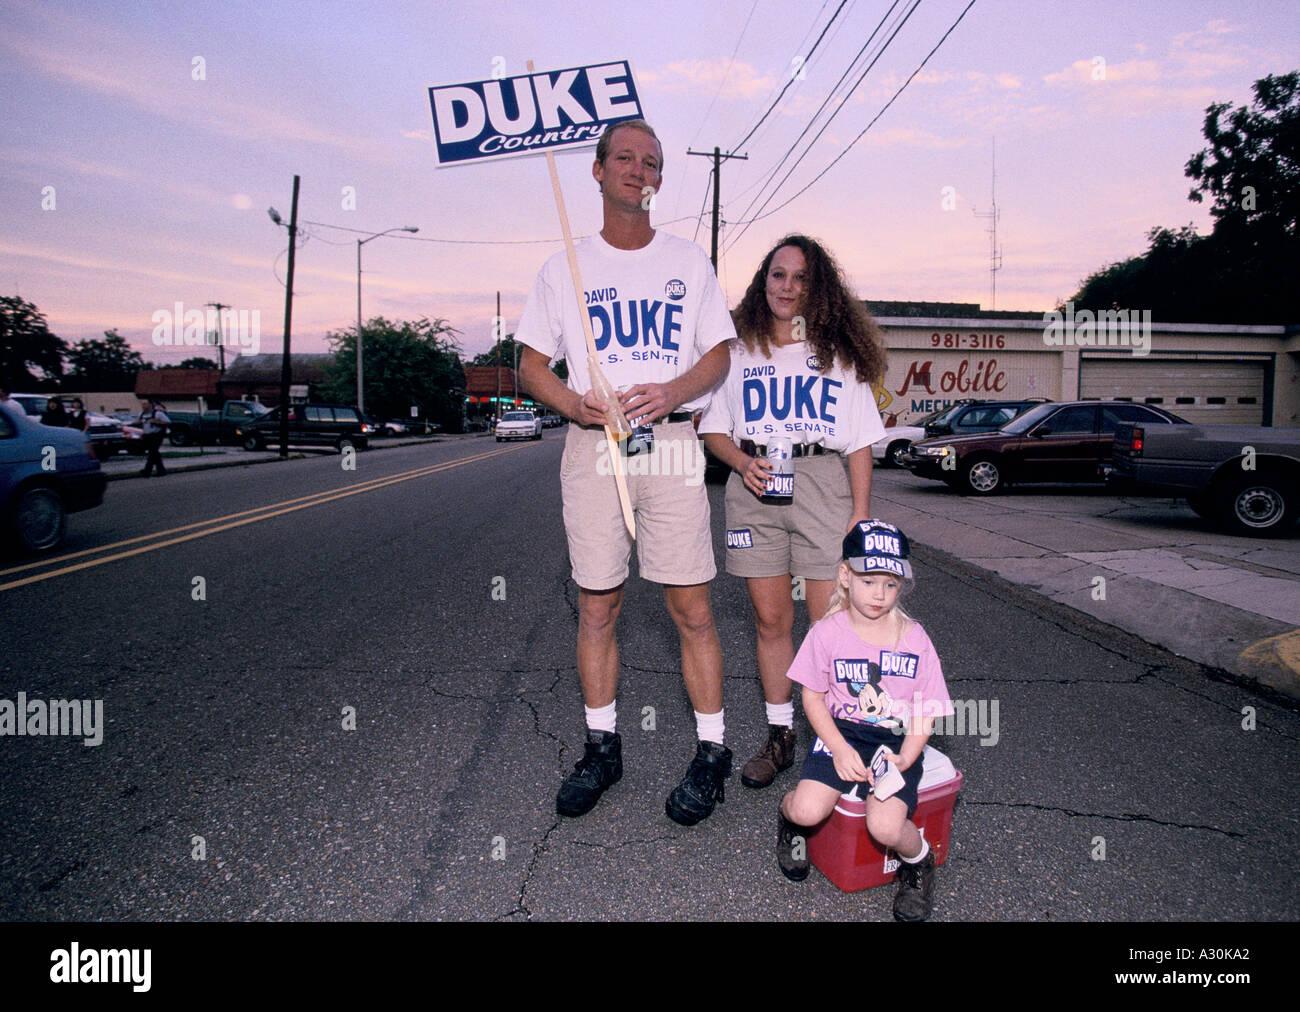 Dukes roller shoes - David Duke Supporters Lafayette Louisiana 1995 Stock Image